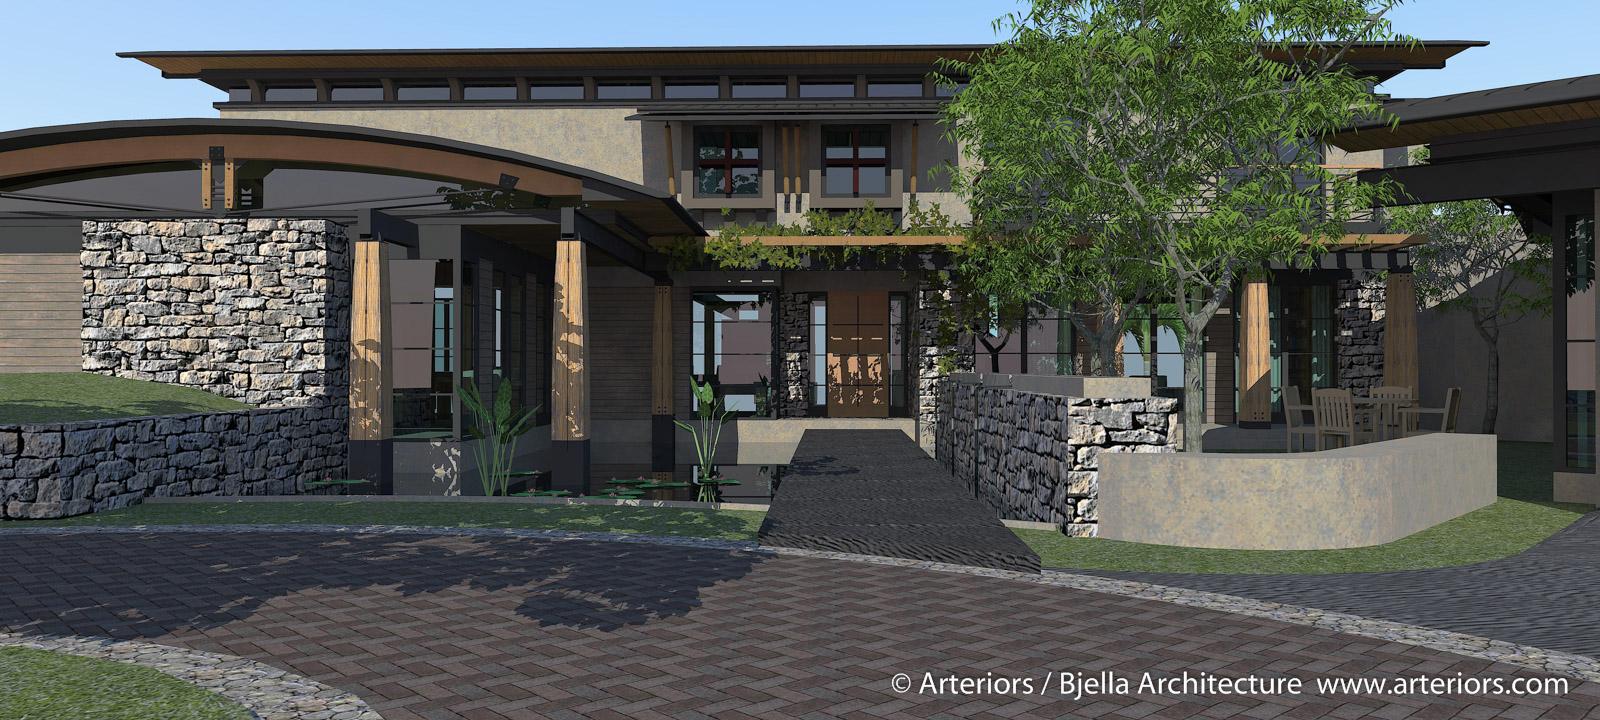 modern-calabasas-home-by-arteriors-architects-bjella-5